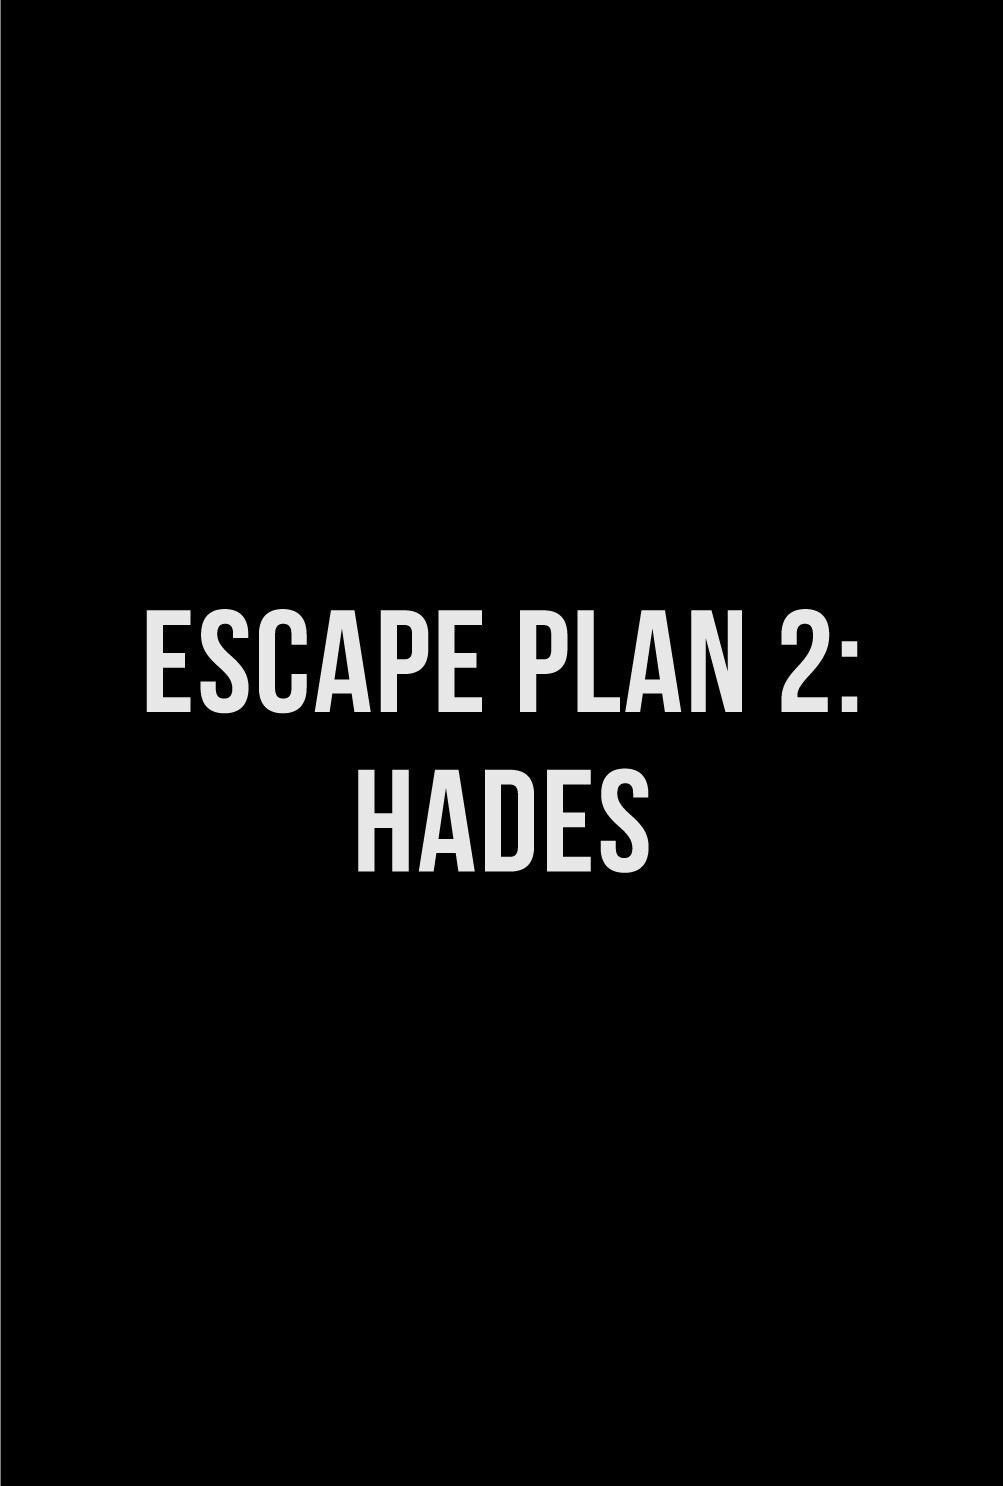 Escape Plan 2 Hades movie poster Fantastic Movie posters # ...